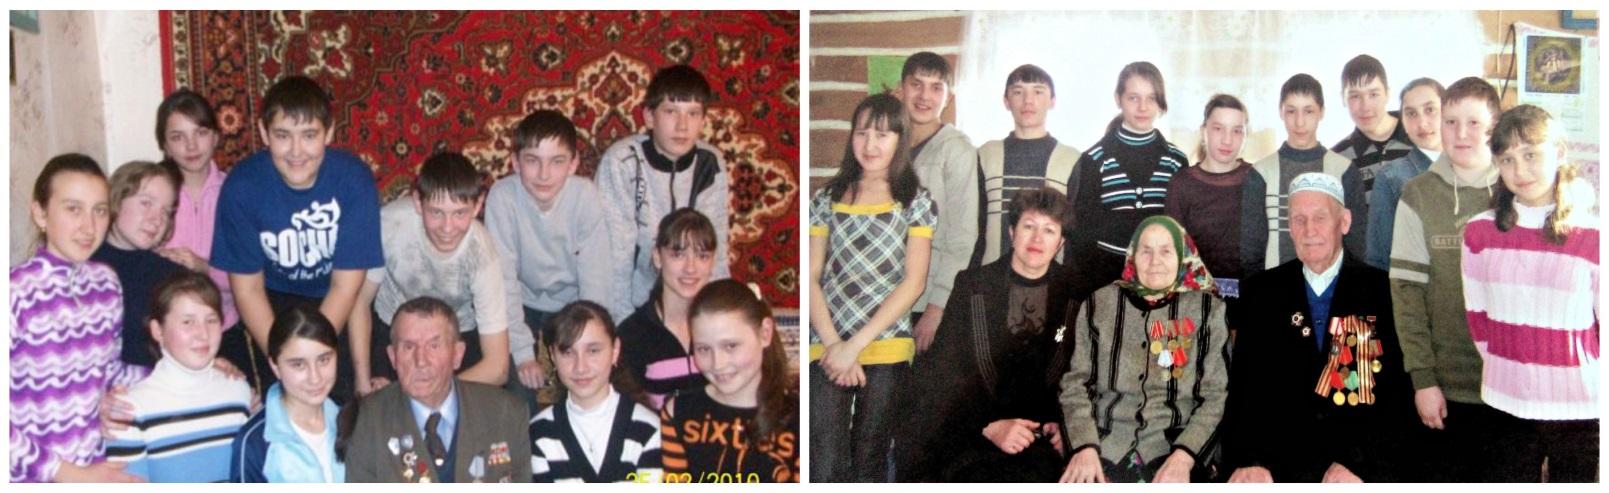 D:\PicMonkey Collage (6).jpg